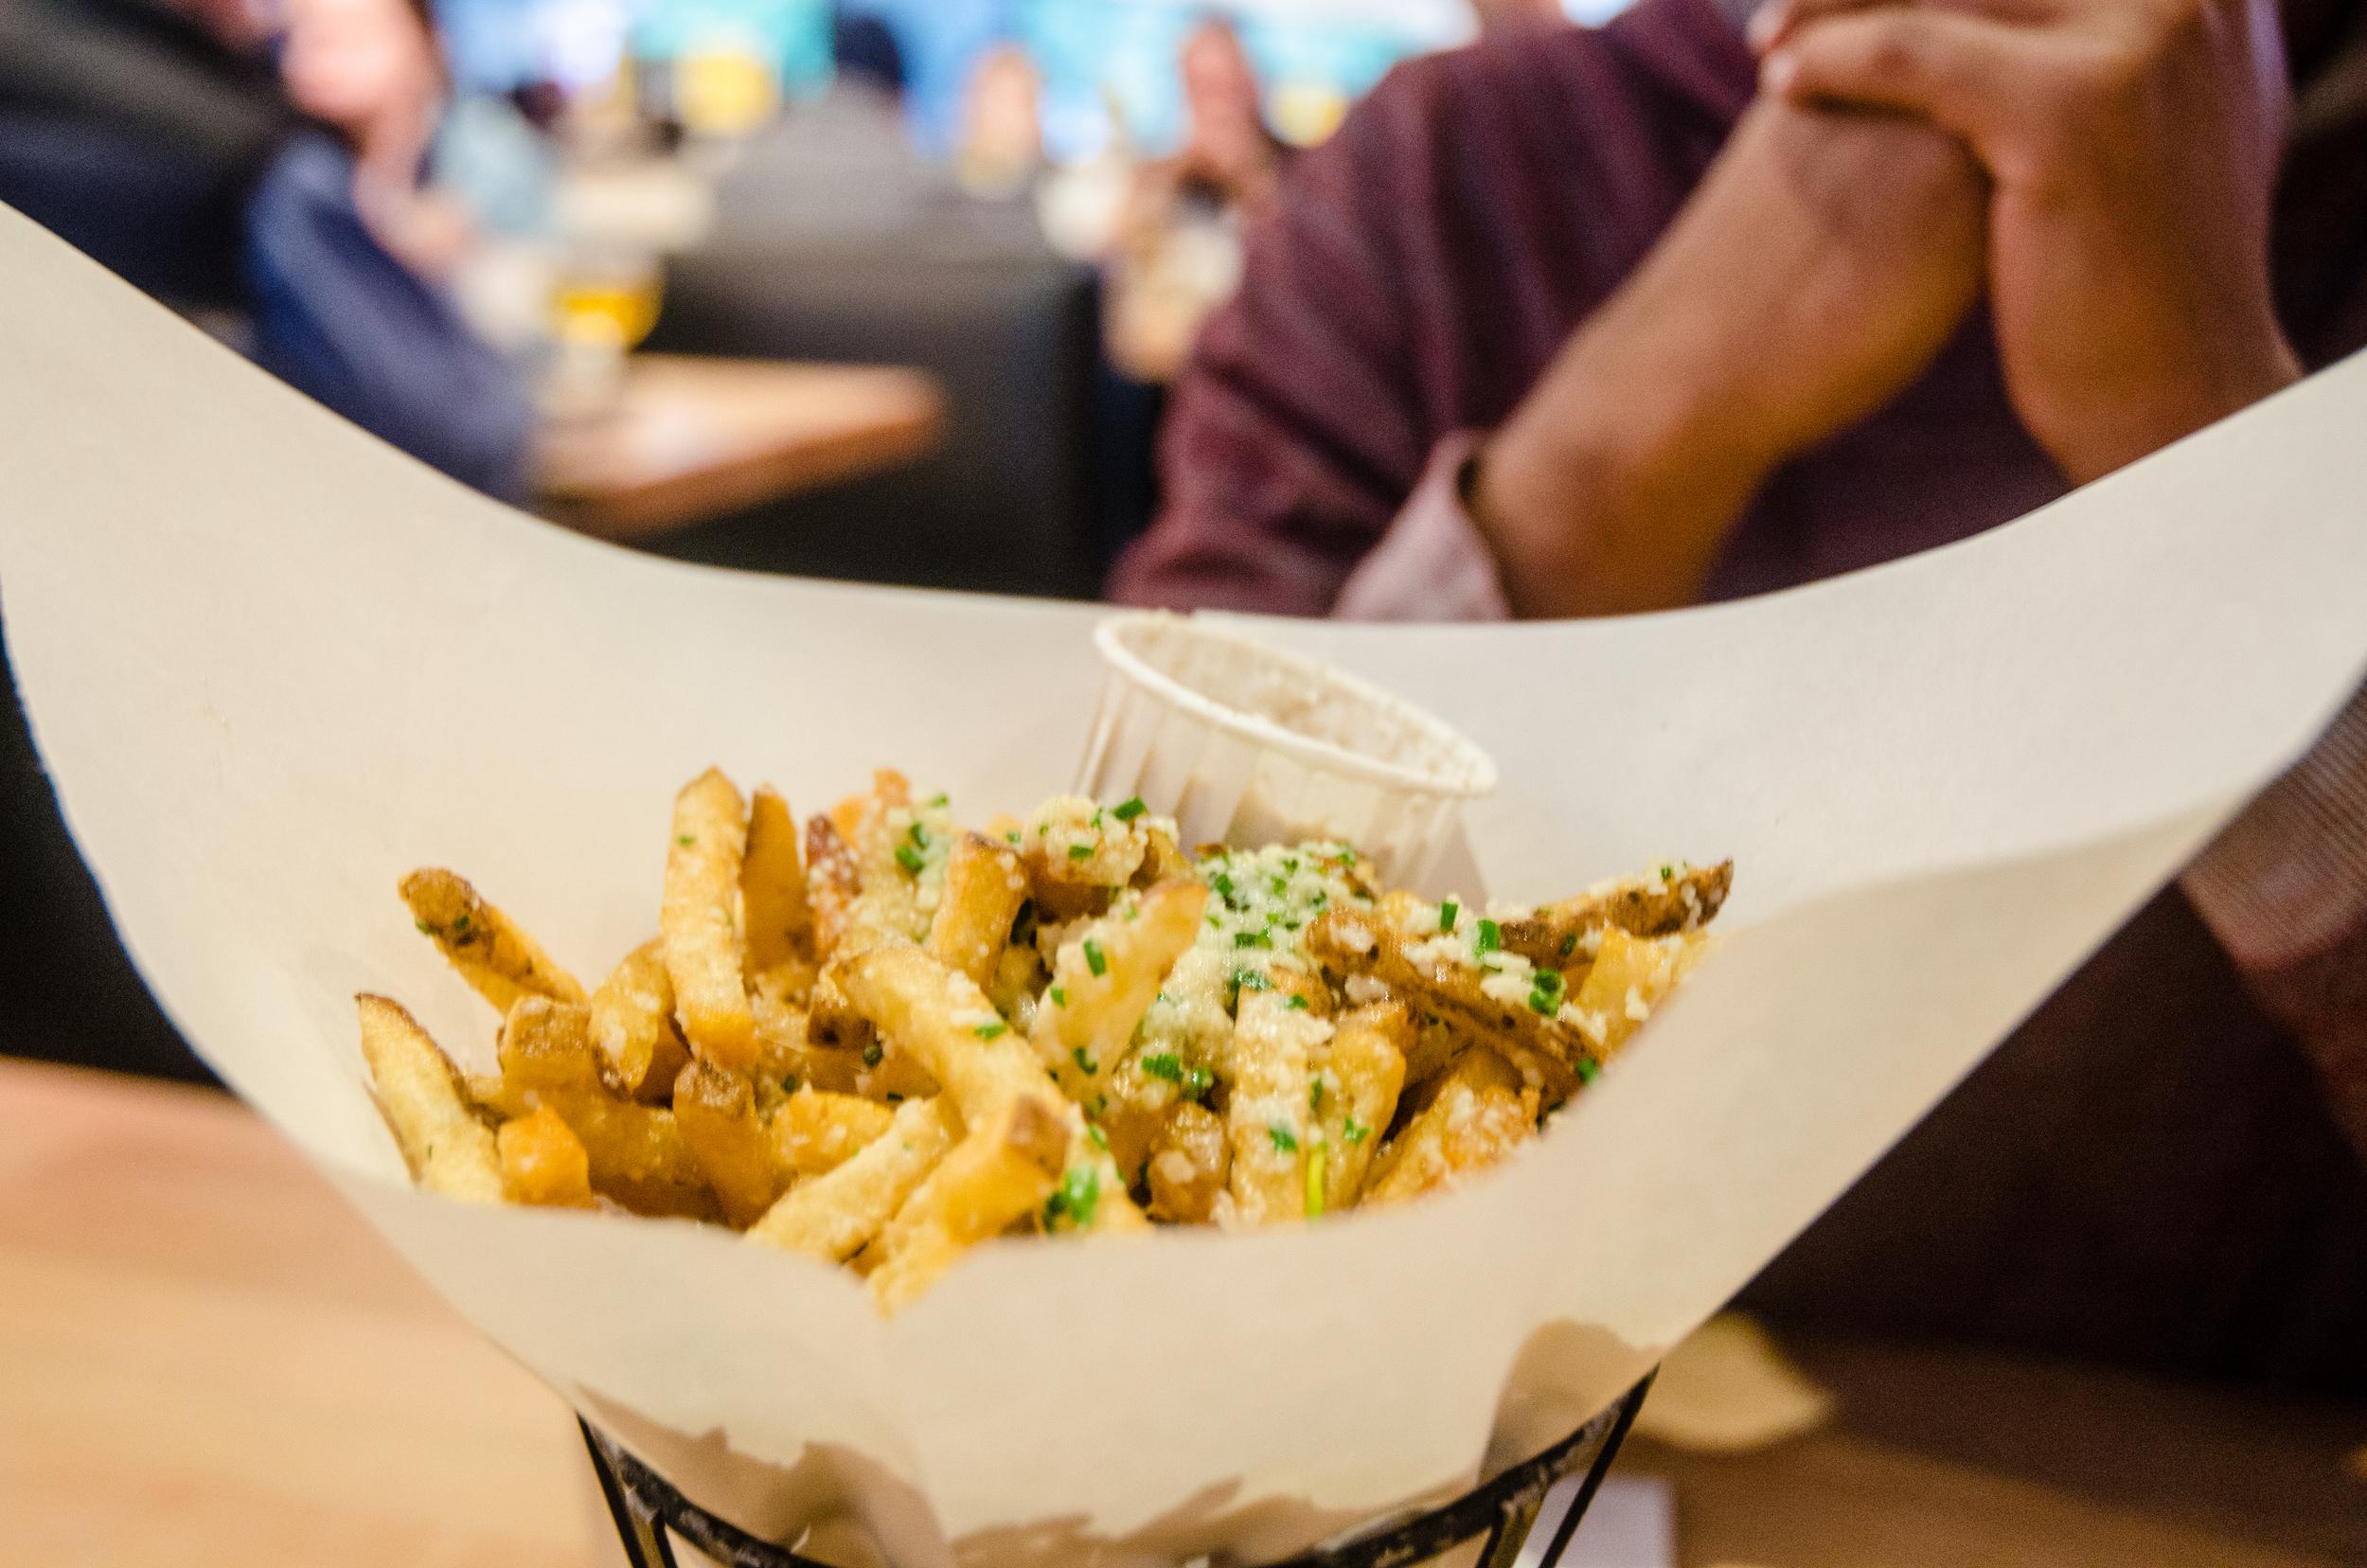 Parmesan Fries with Mushroom Sauce